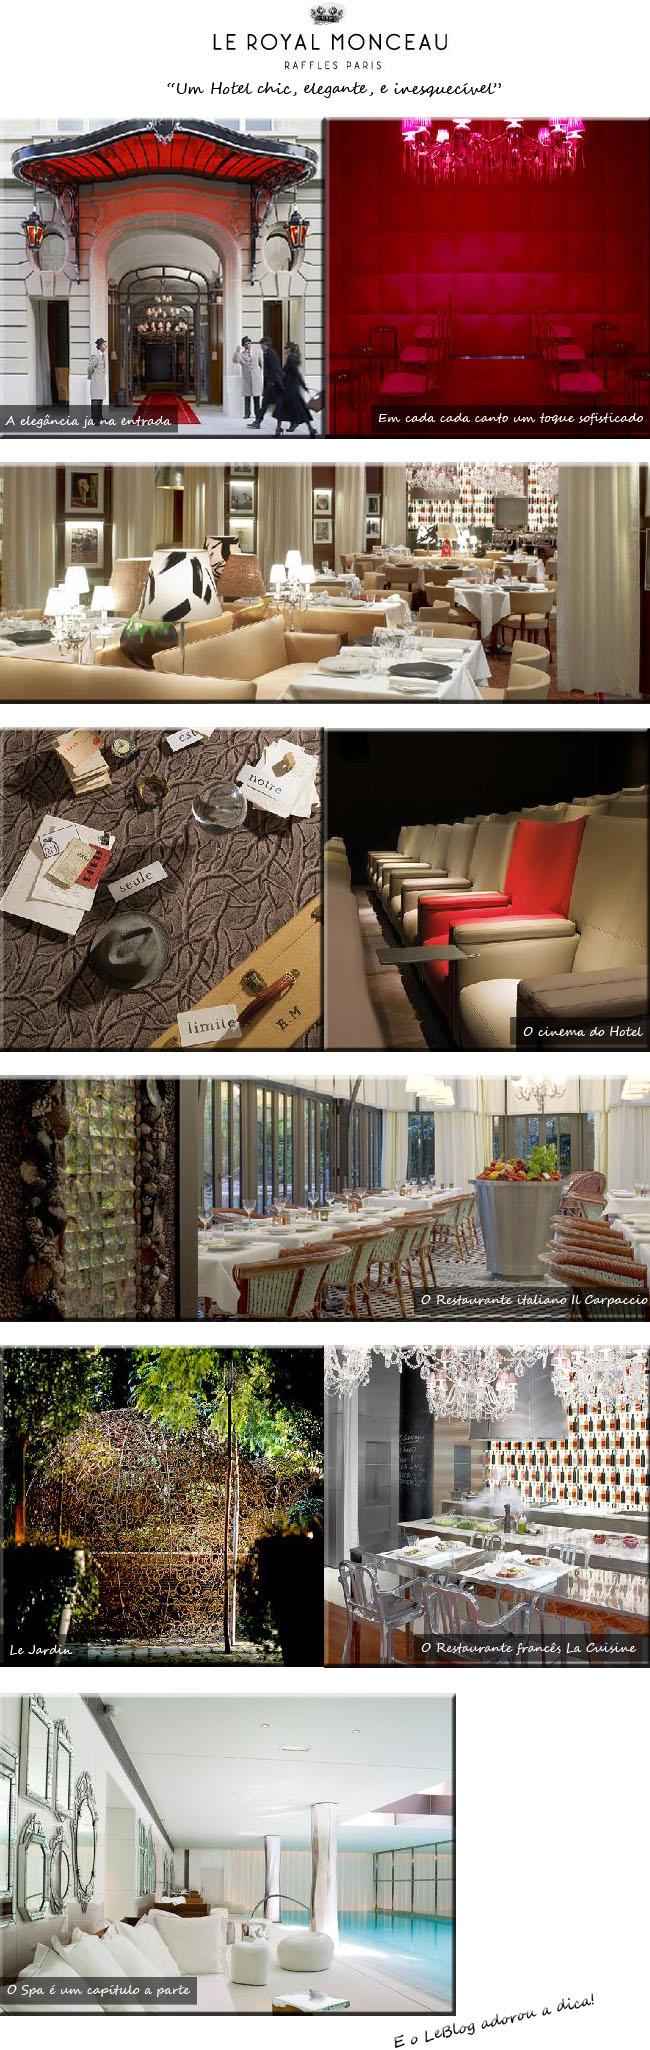 Le Royal Monceau, dicas de Paris, hotéis em Paris, dicas de Donata Meirelles, melhores hotéis de Paris